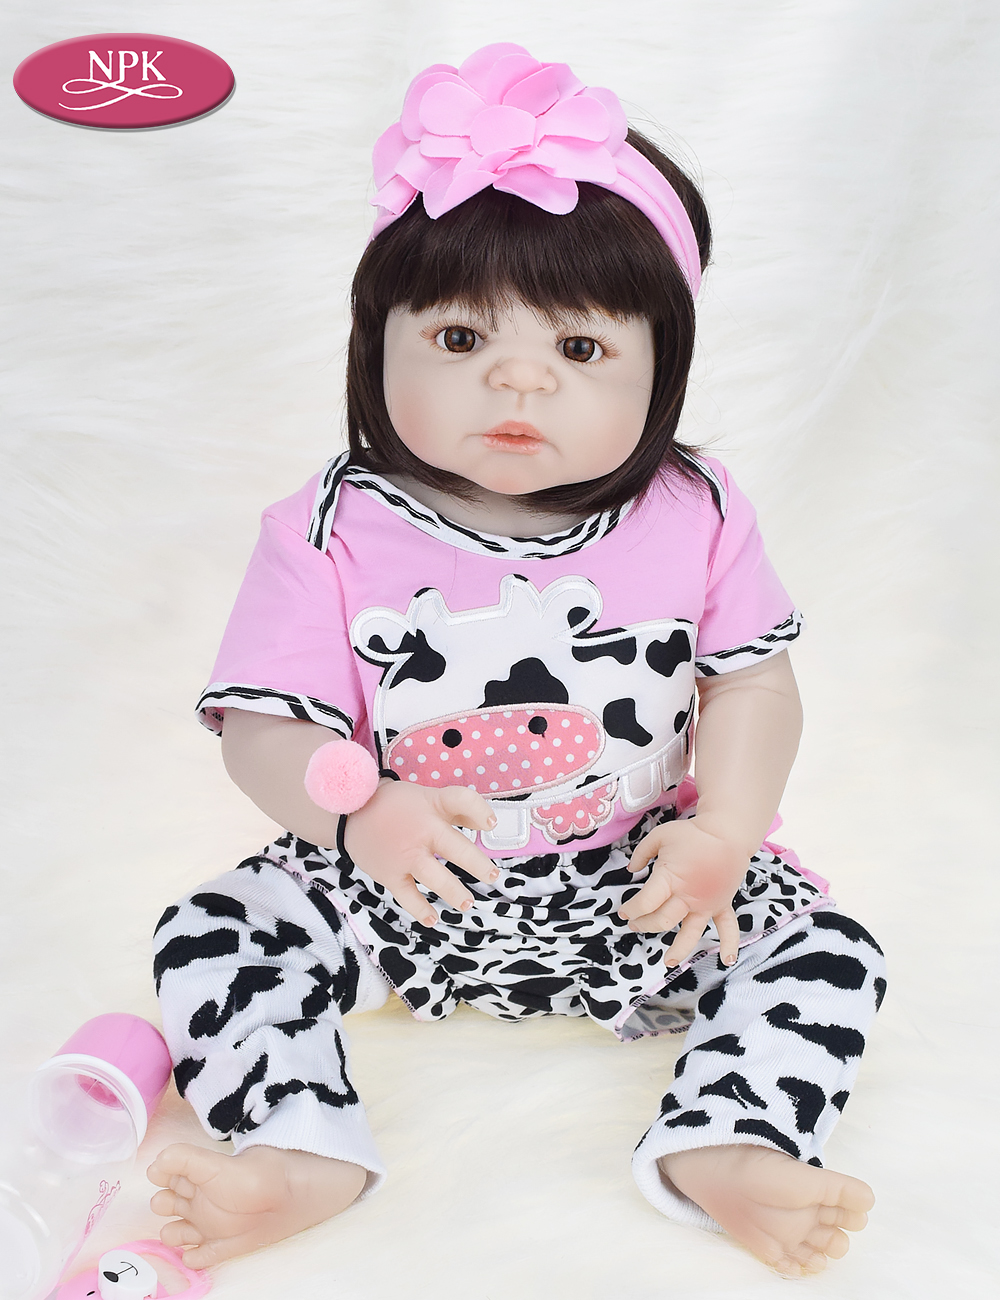 NPK Real 57CM Full Body SIlicone Girl Reborn Babies Doll Bath Toy Lifelike Newborn Princess Baby Doll Bonecas Bebe Reborn Menina (4)